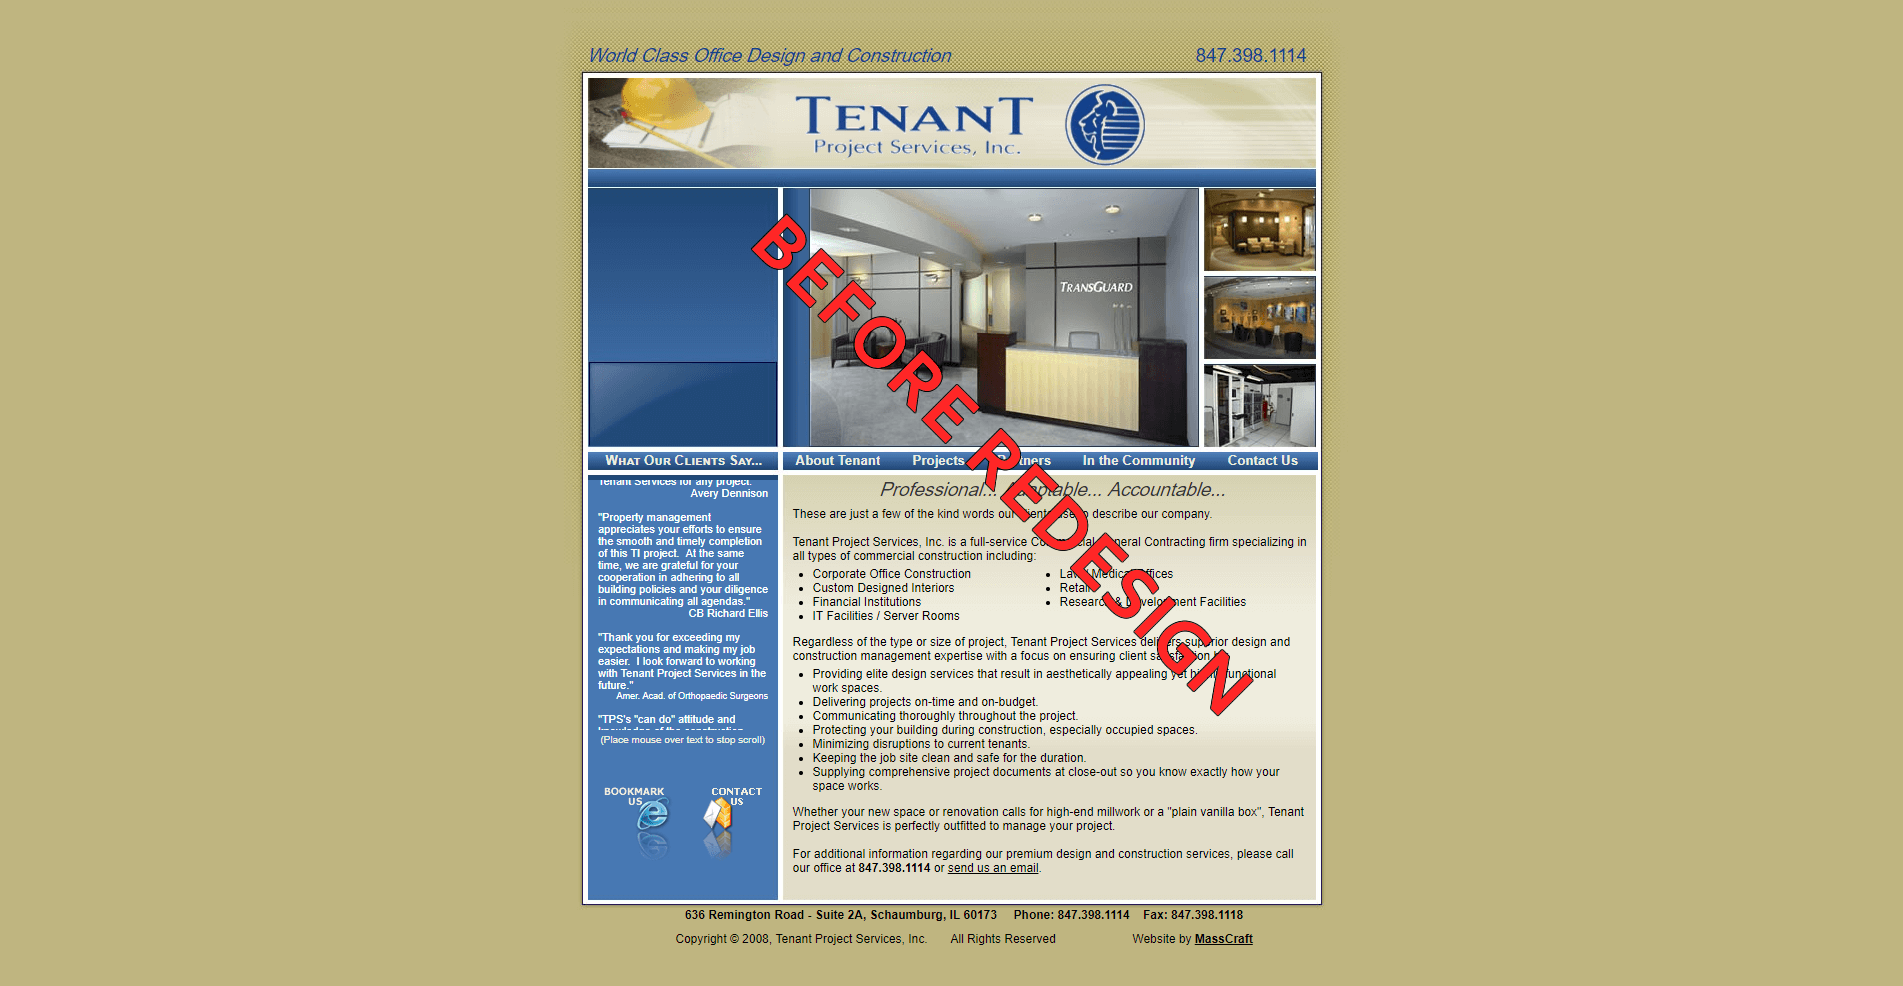 Tenant Project Services, Inc.